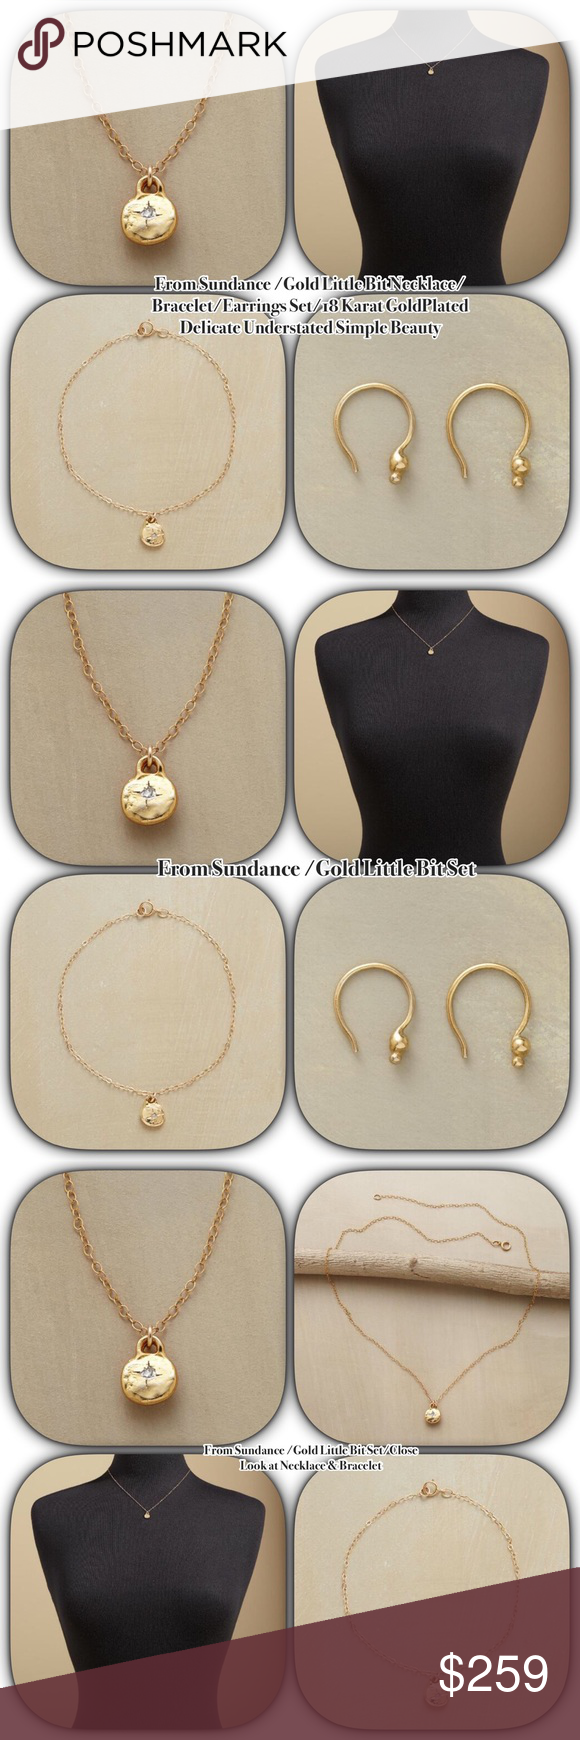 Sold prelovedfrom sundancegold little bit s sundance jewelry